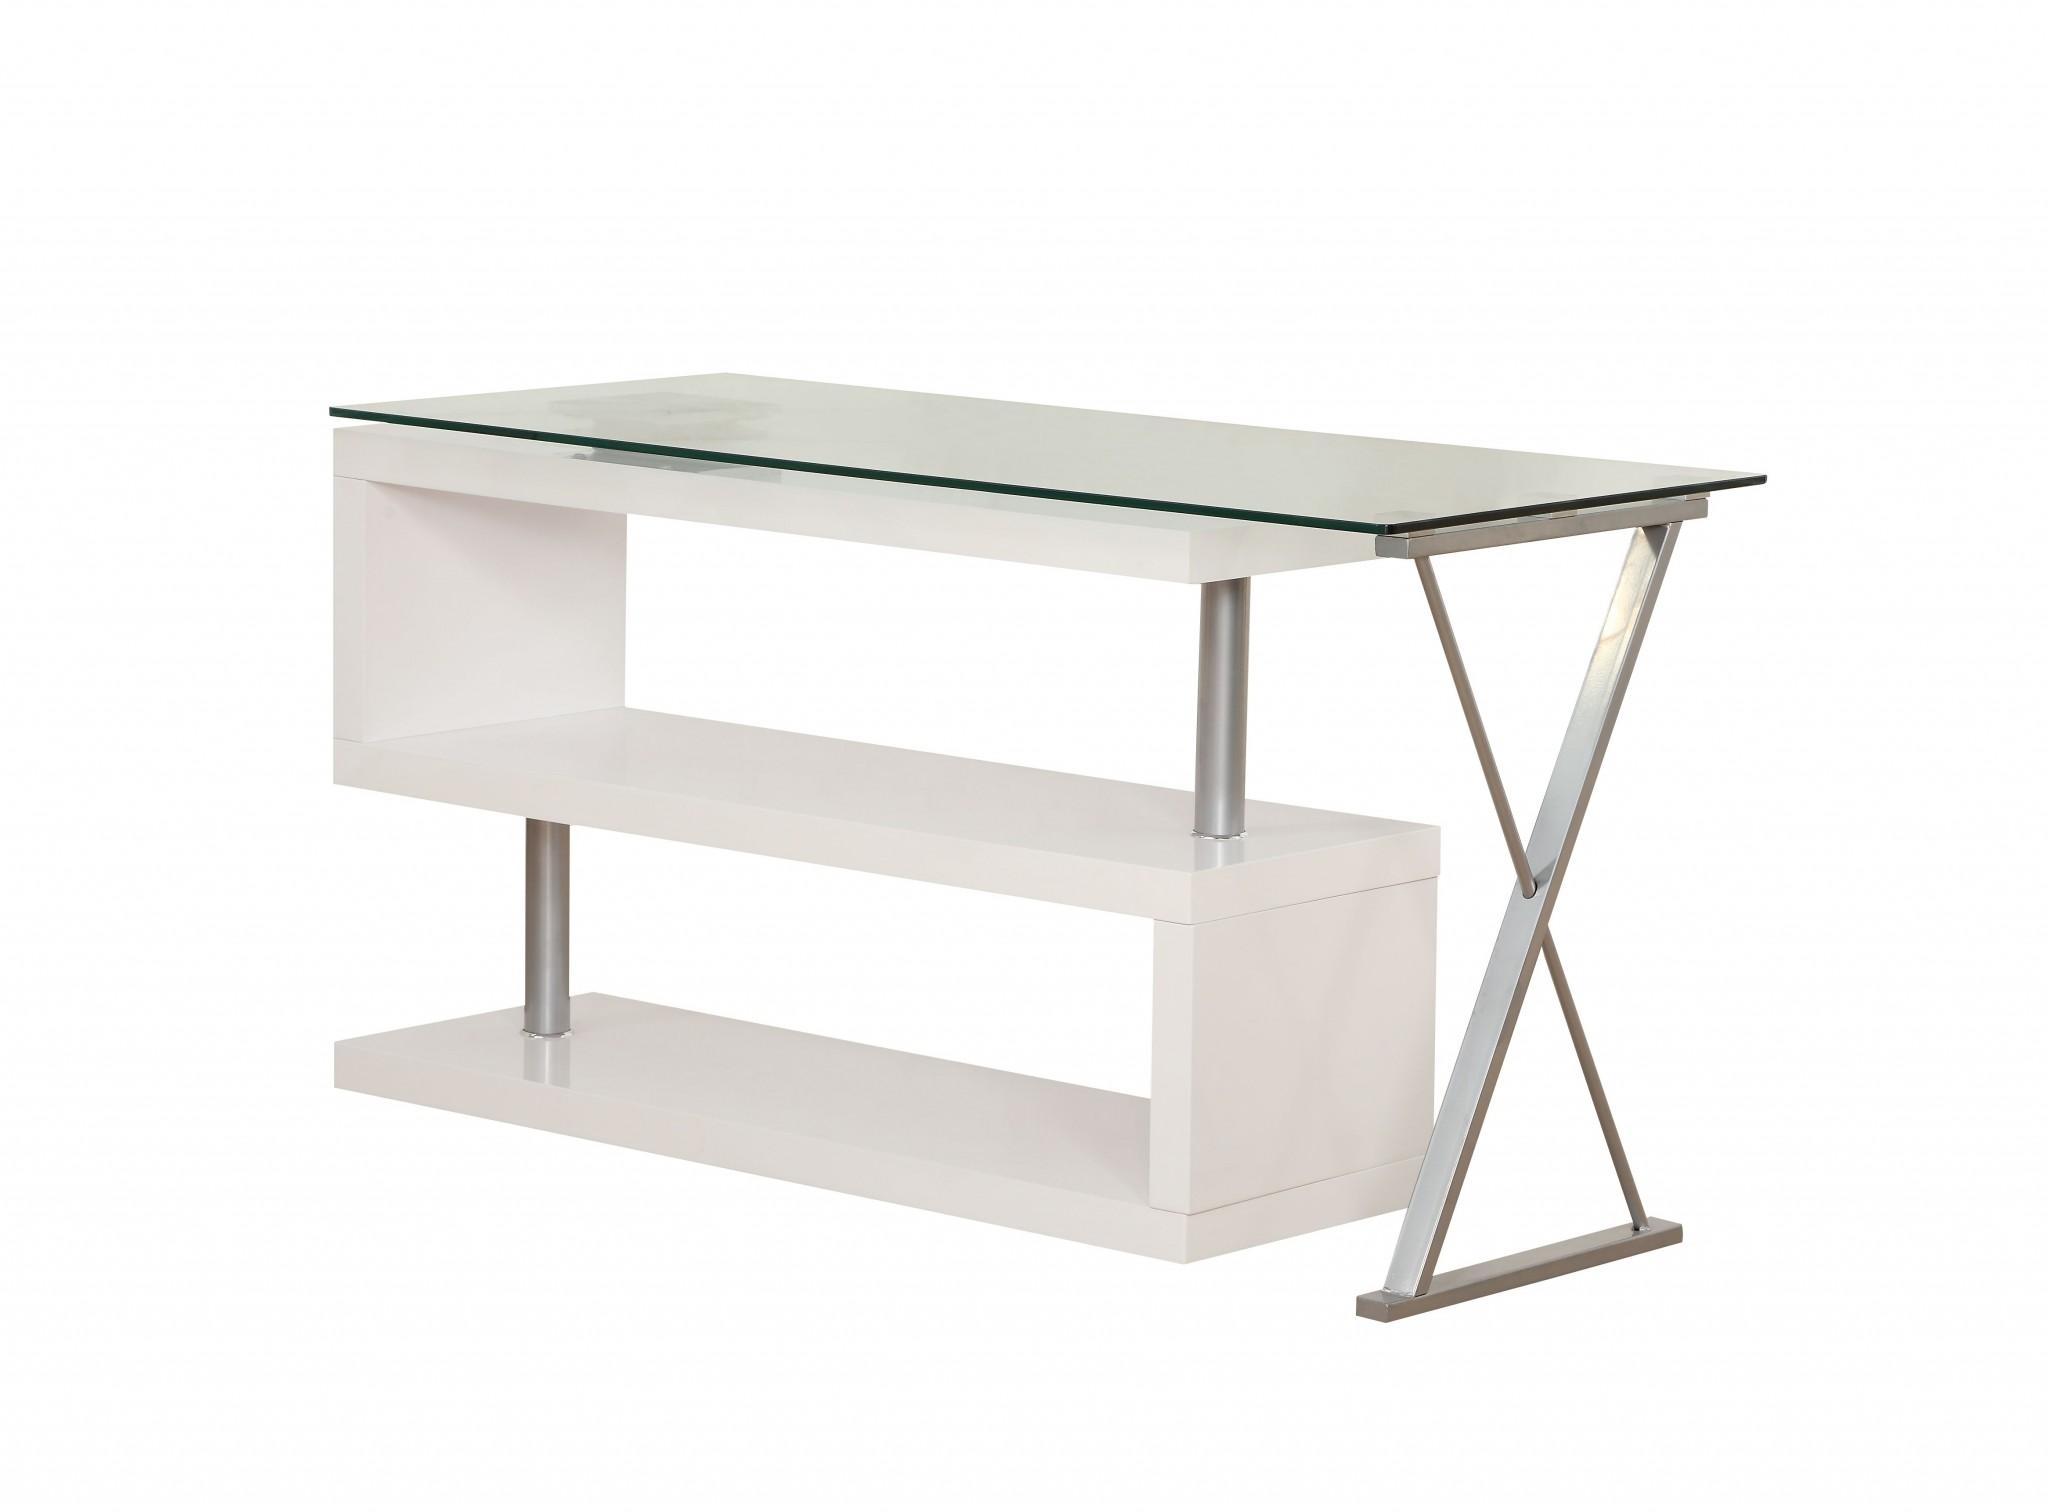 "55"" X 47"" X 30"" White High Gloss & Clear Glass Office Desk"